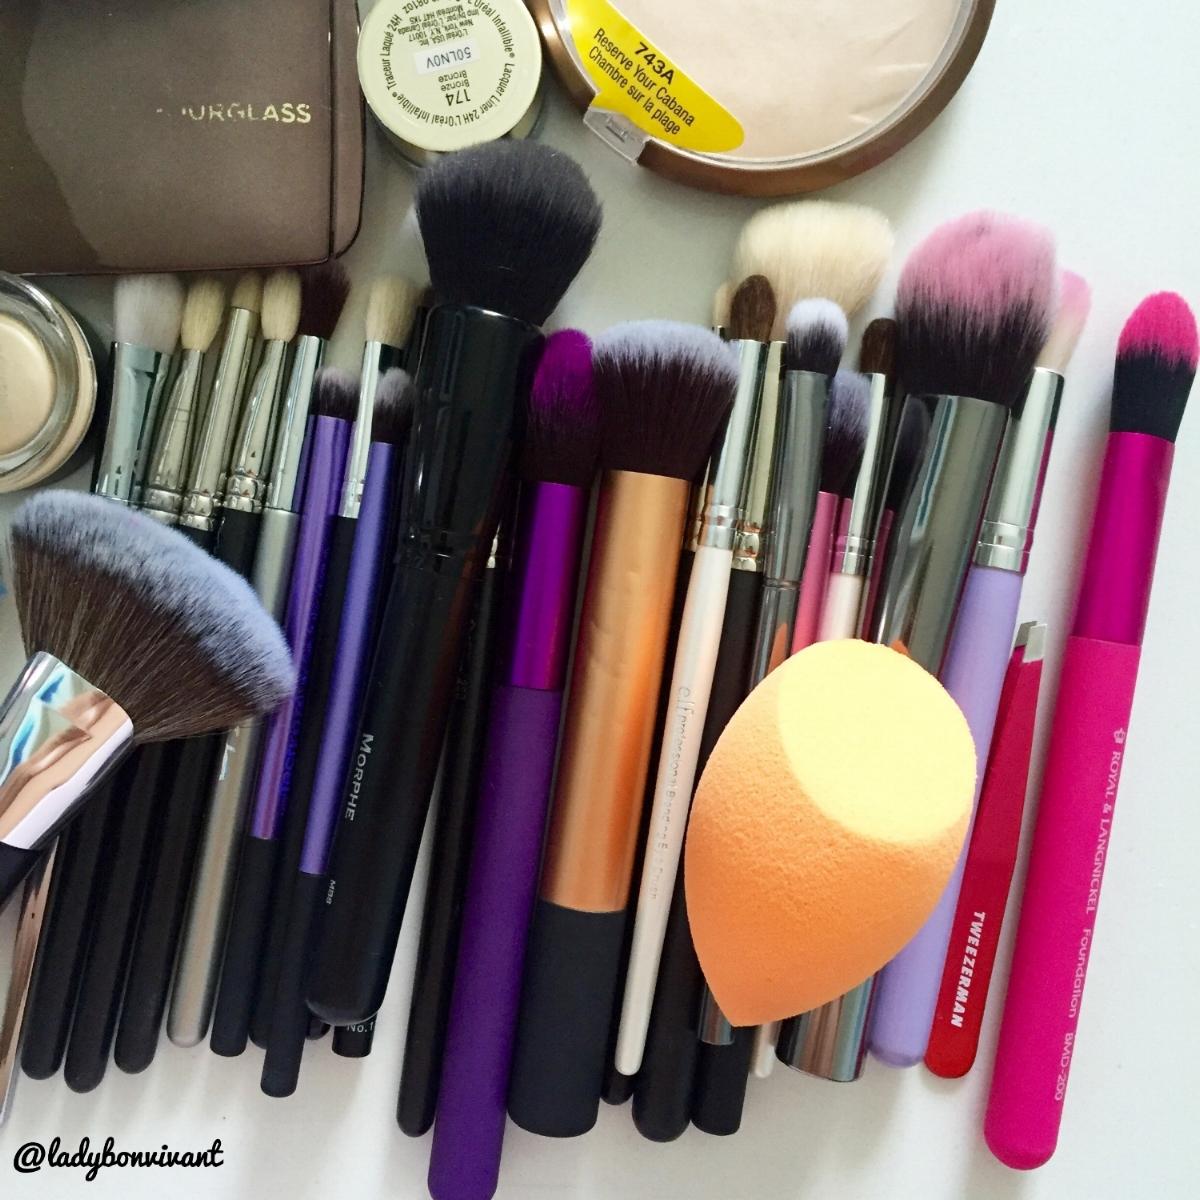 So many eyeshadow brushes...